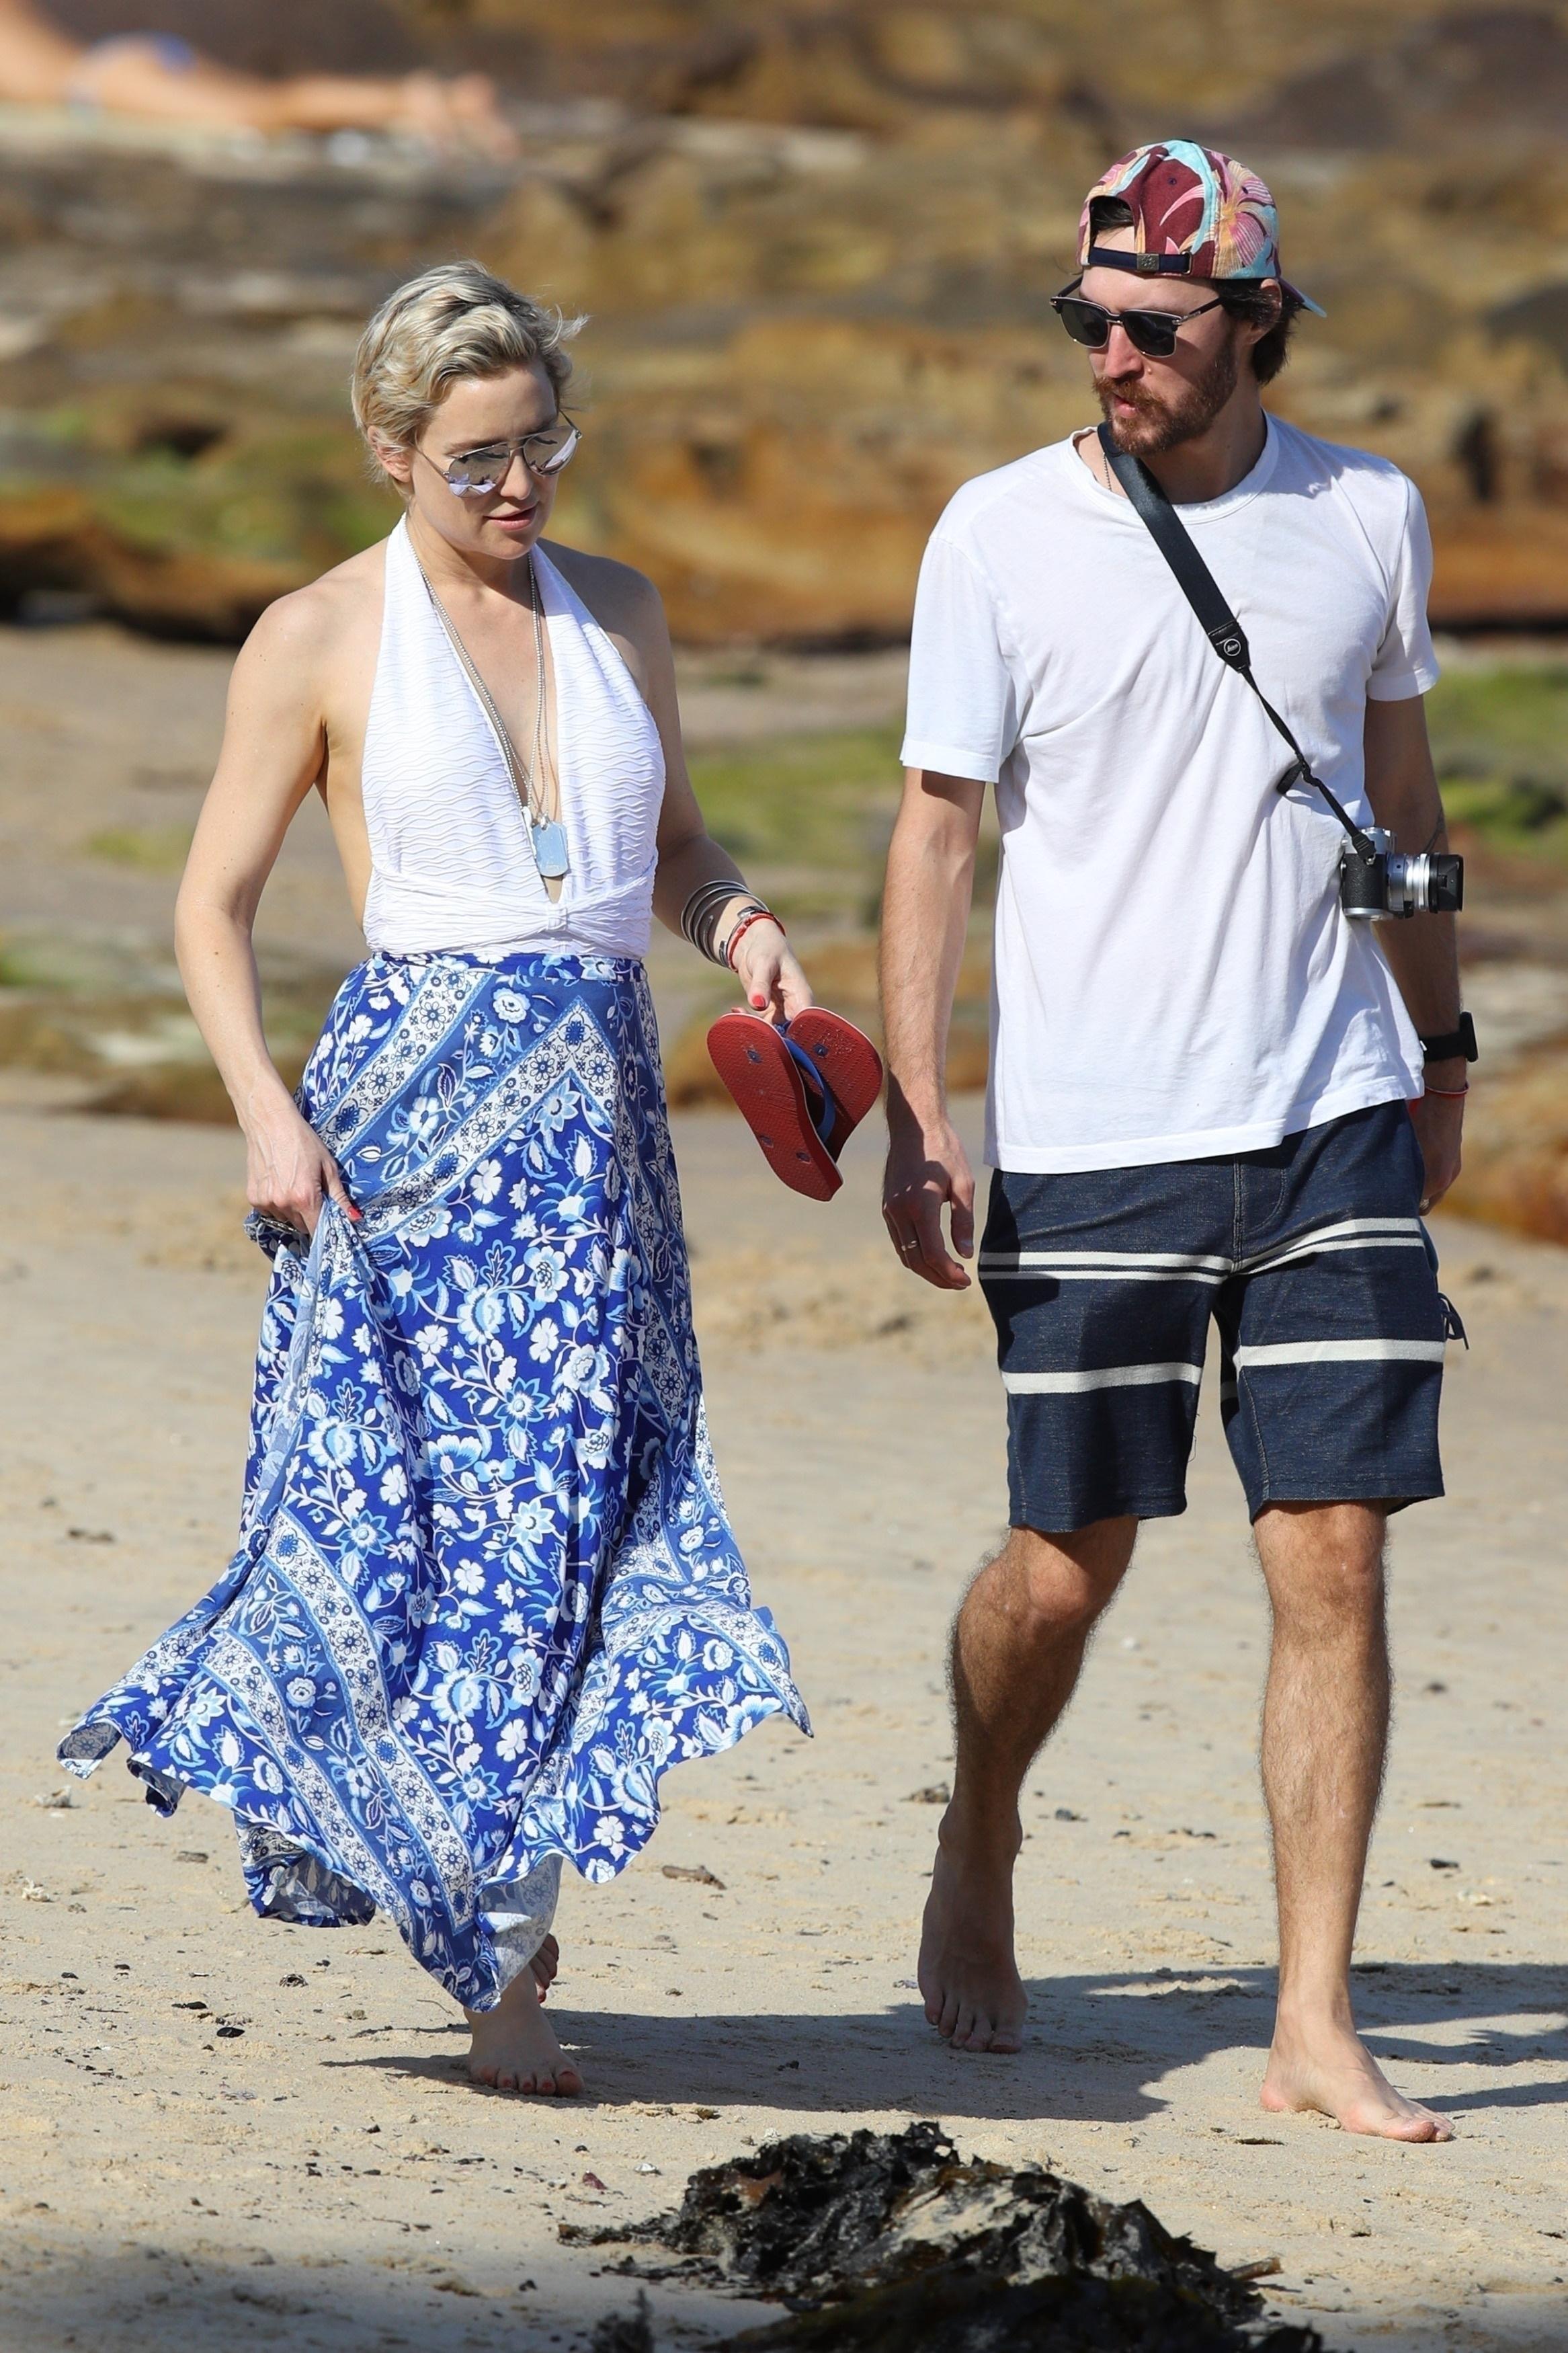 Kate Hudson and boyfriend Danny Fujikawa enjoy each other's company as they take an evening stroll on Balmoral Beach in Mosman, Australia, on Feb. 18, 2018.